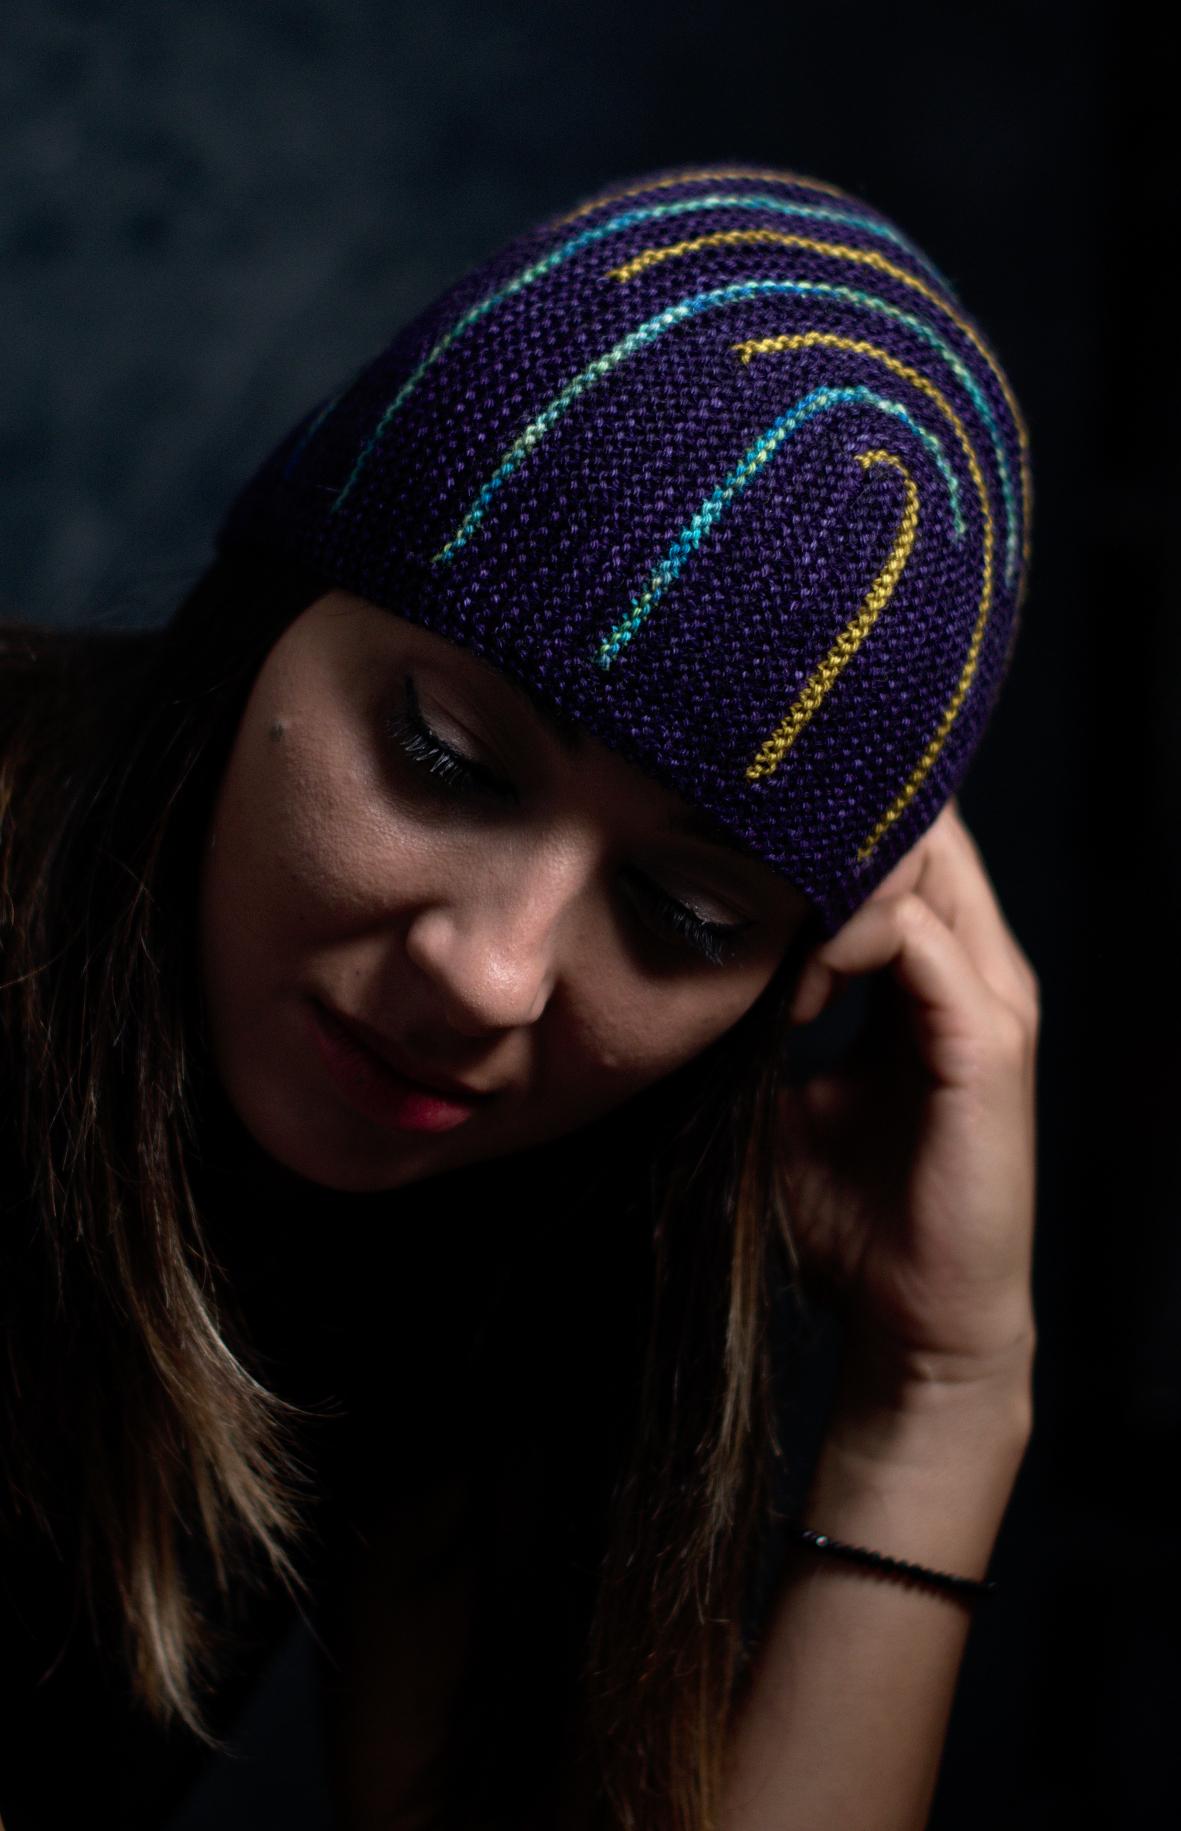 Duality sideways knit short row colourwork hat hand knitting pattern